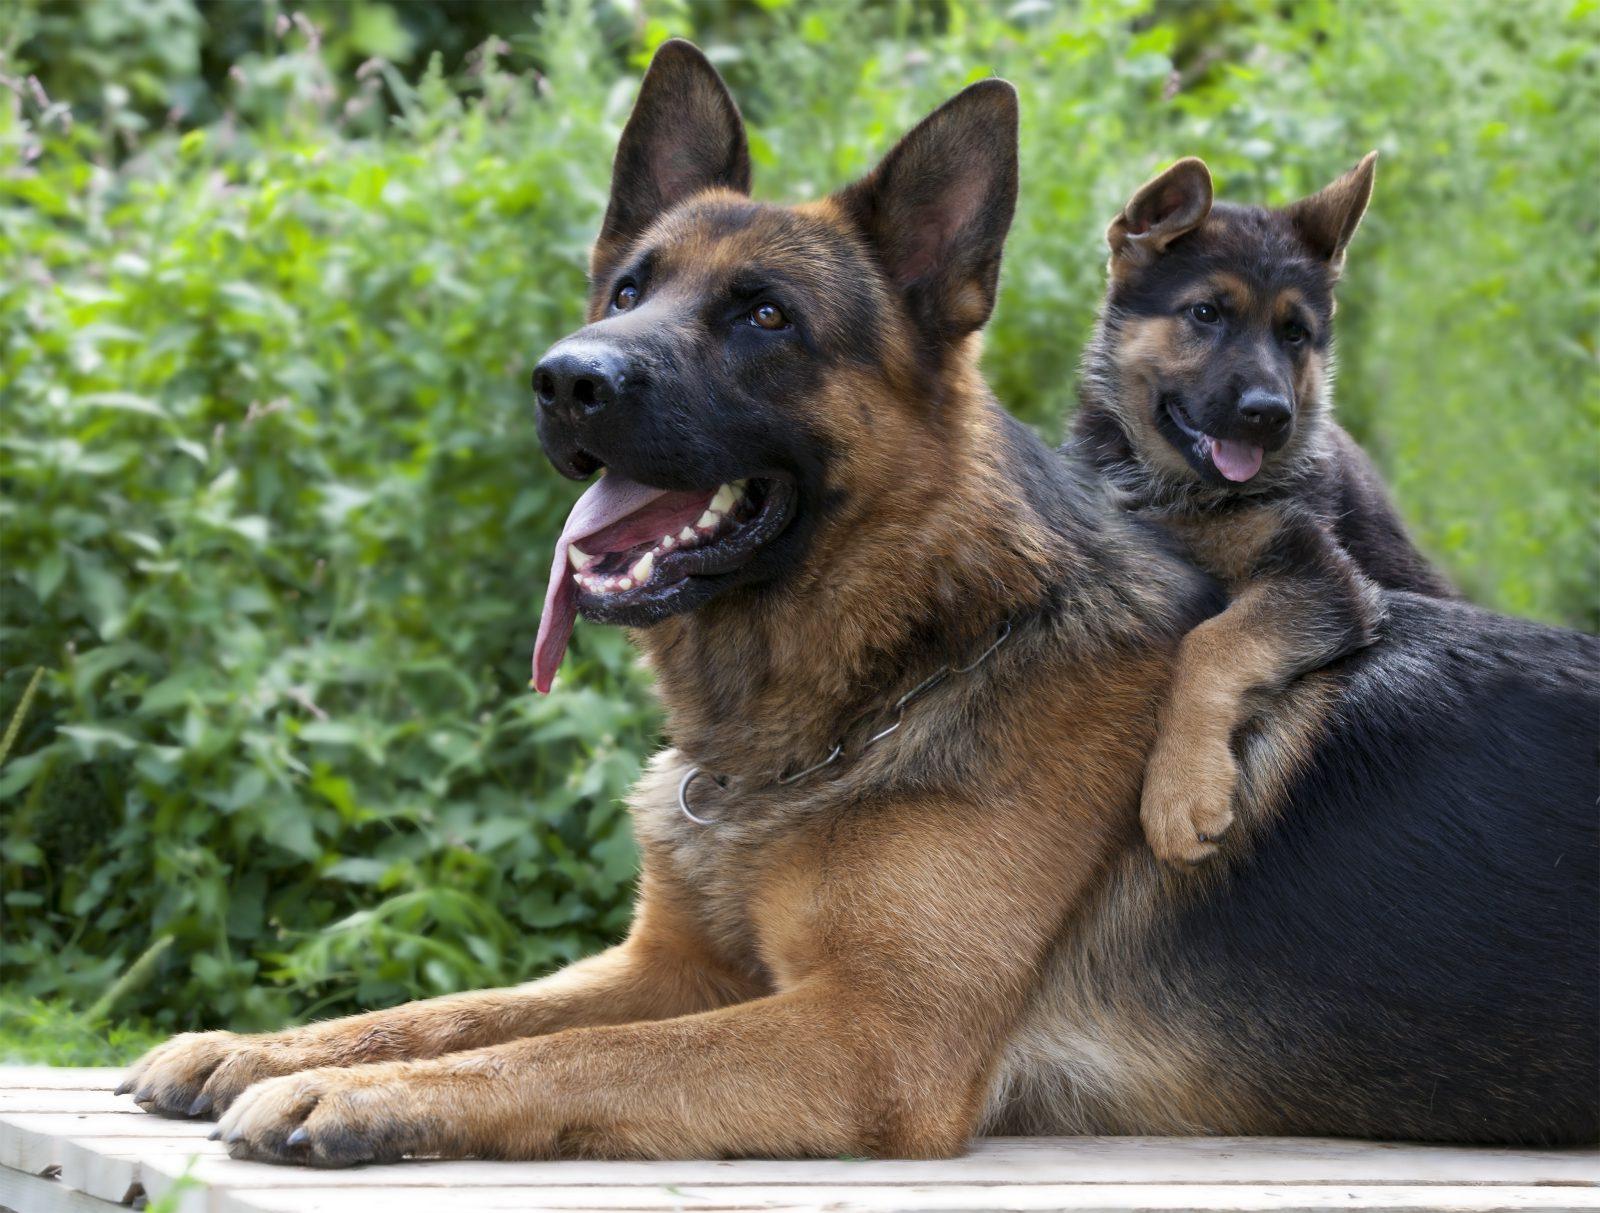 racas-popular-cachorro-arruinadas-pastor-alemao